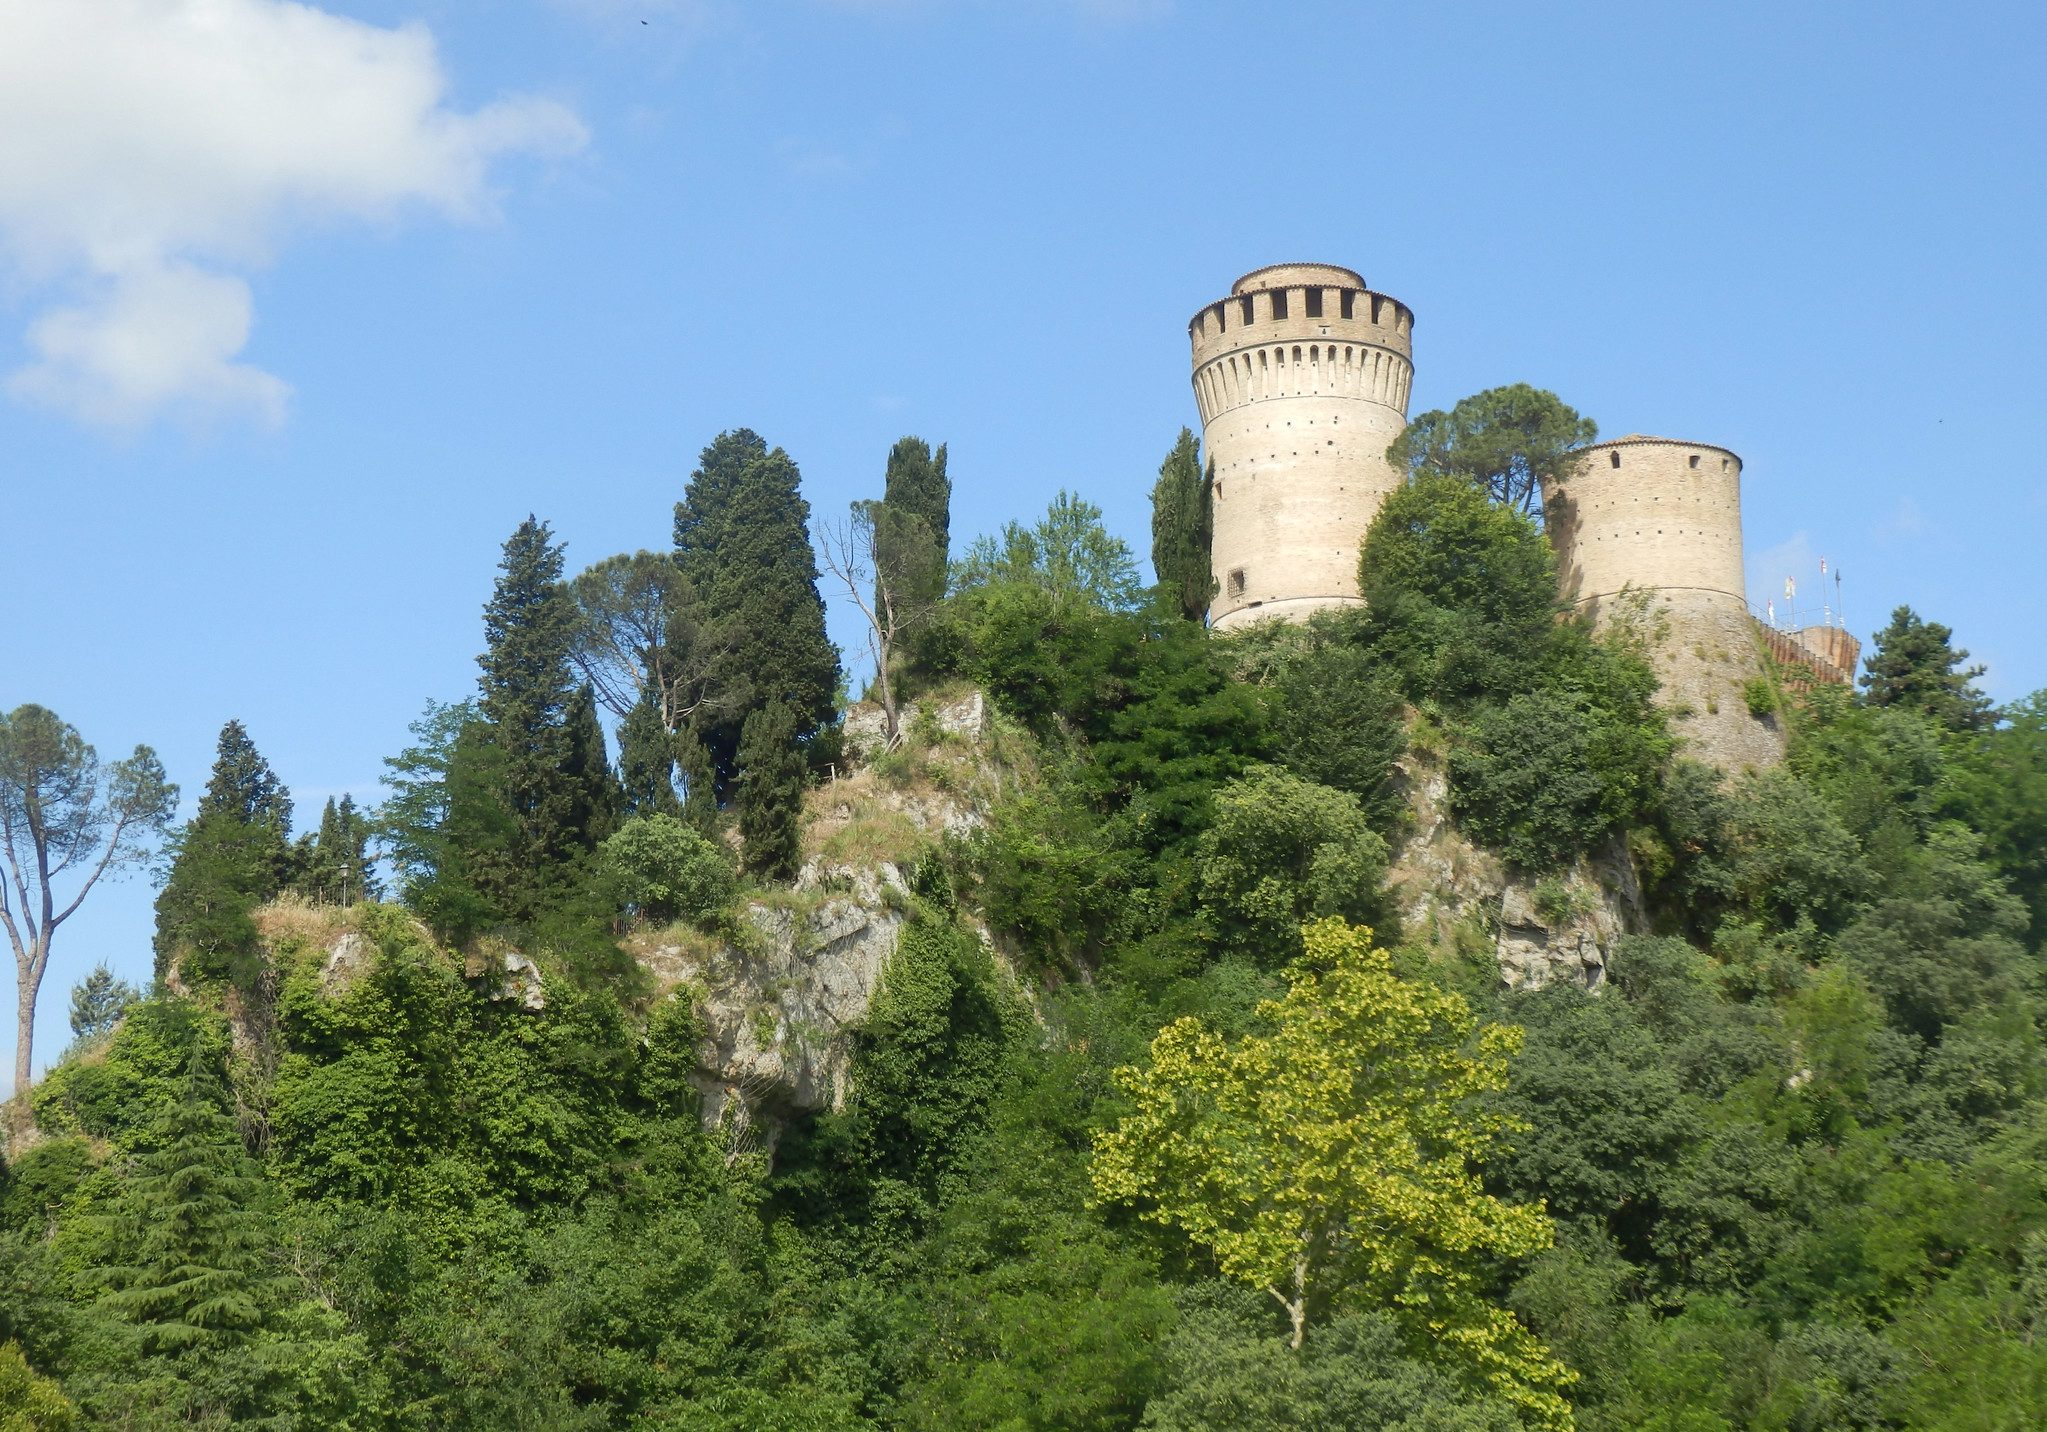 borghi medievali emilia romagna da visitare